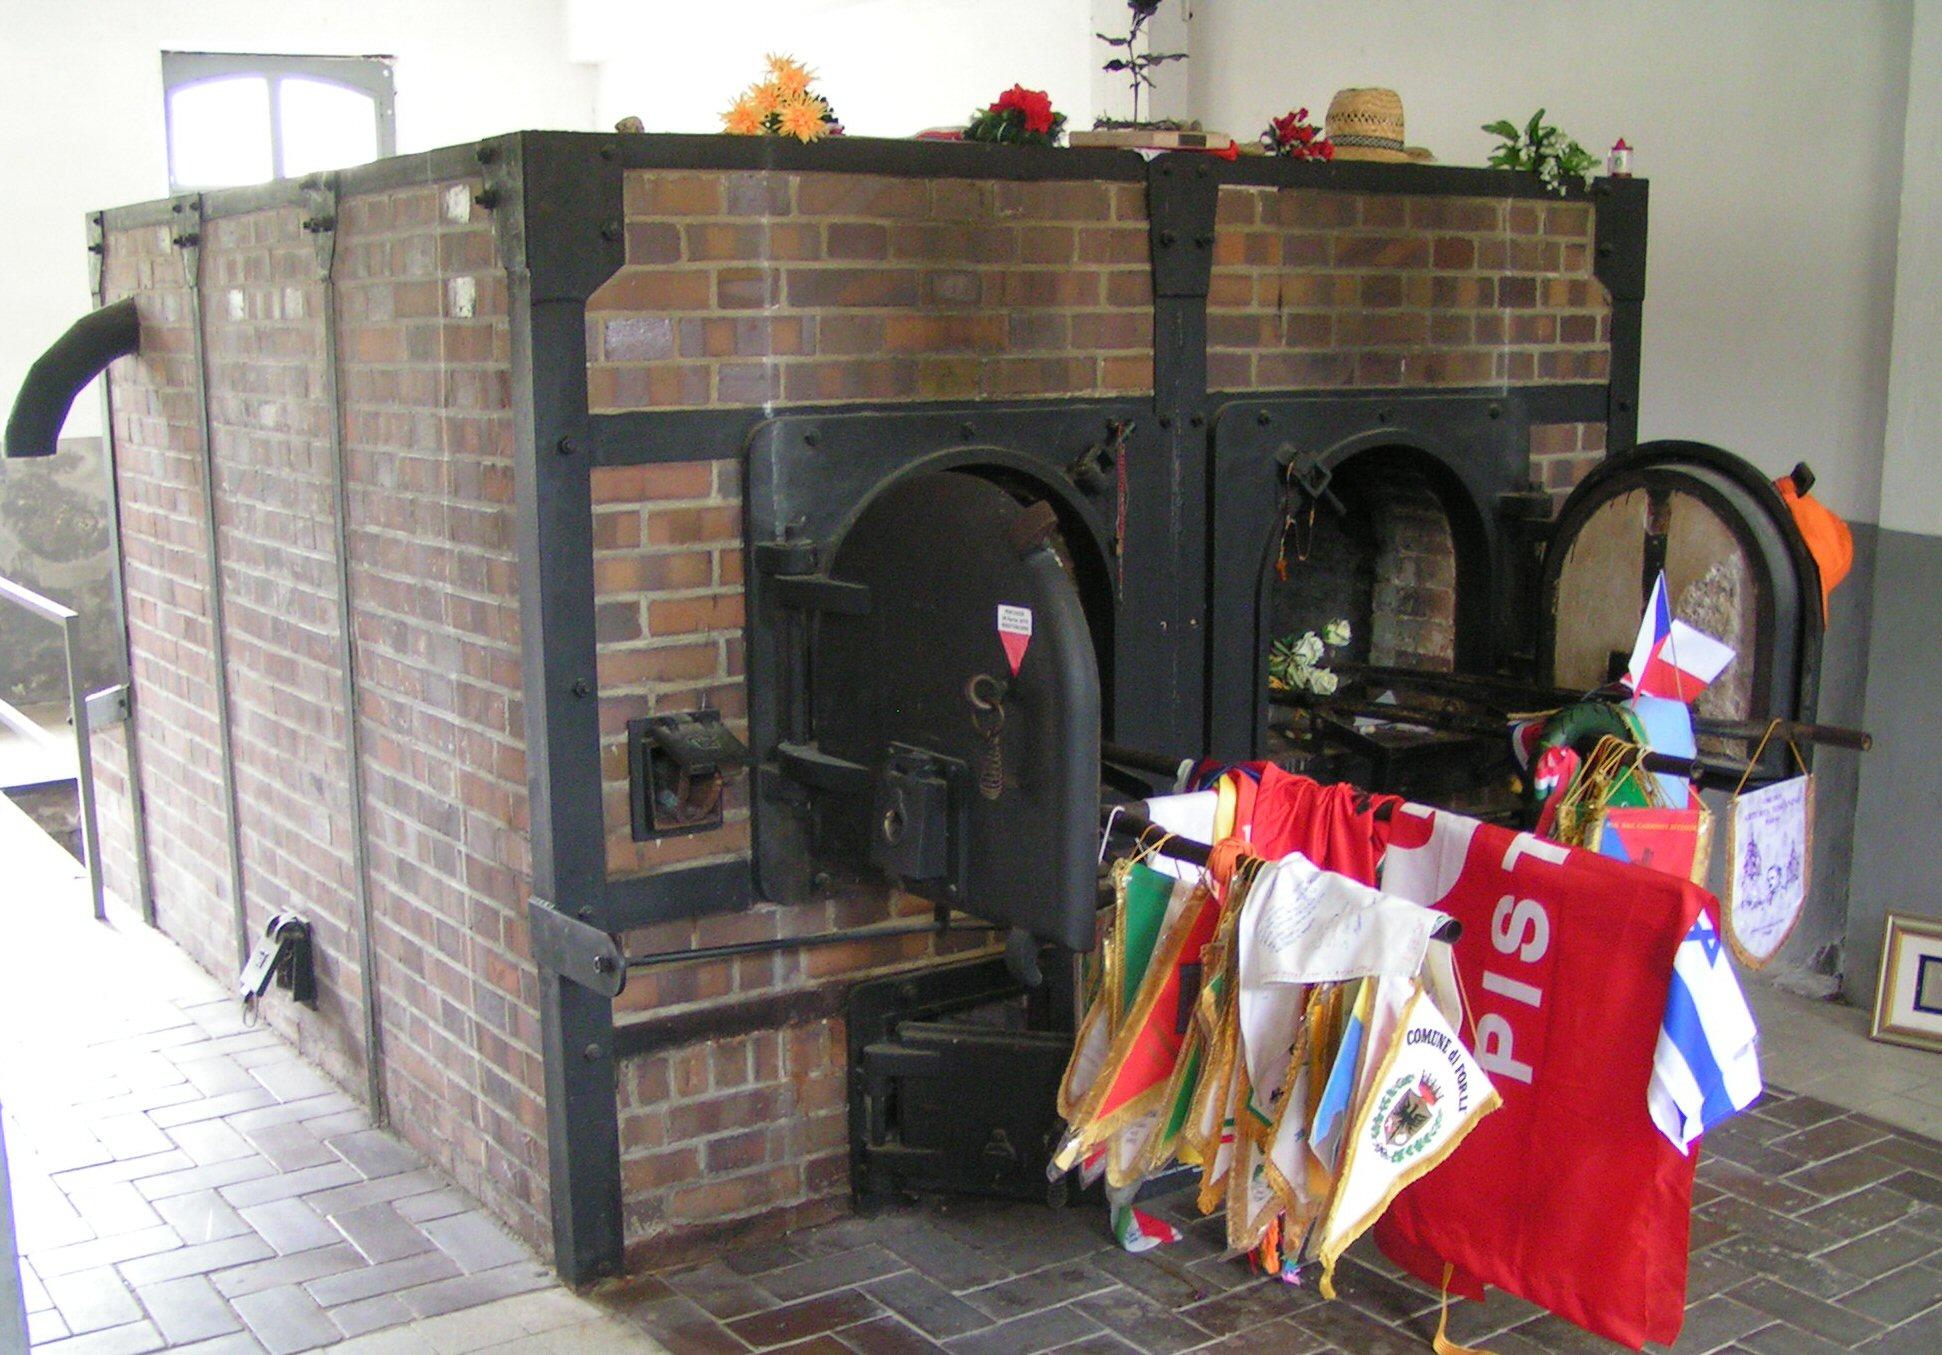 MauthausenCrematoria